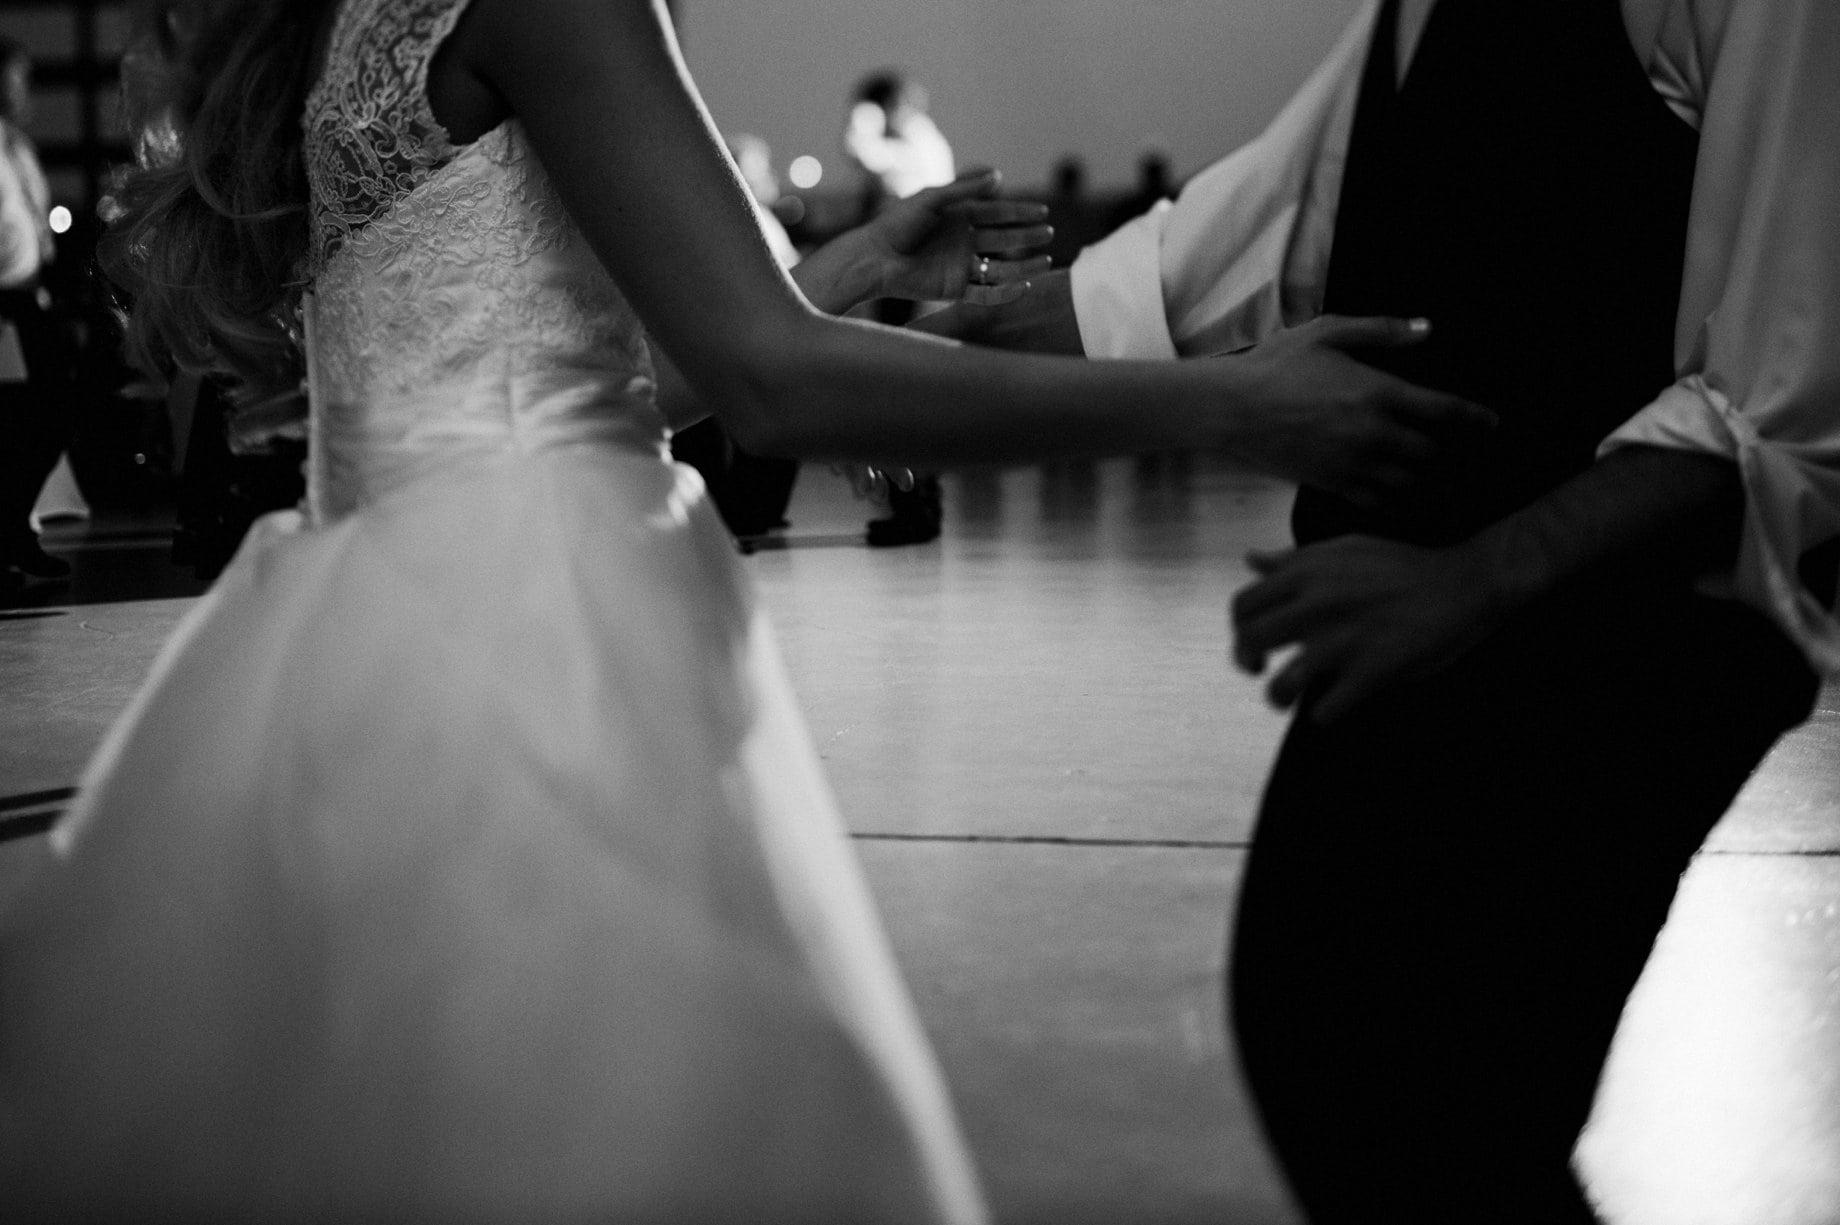 abstract wedding photography